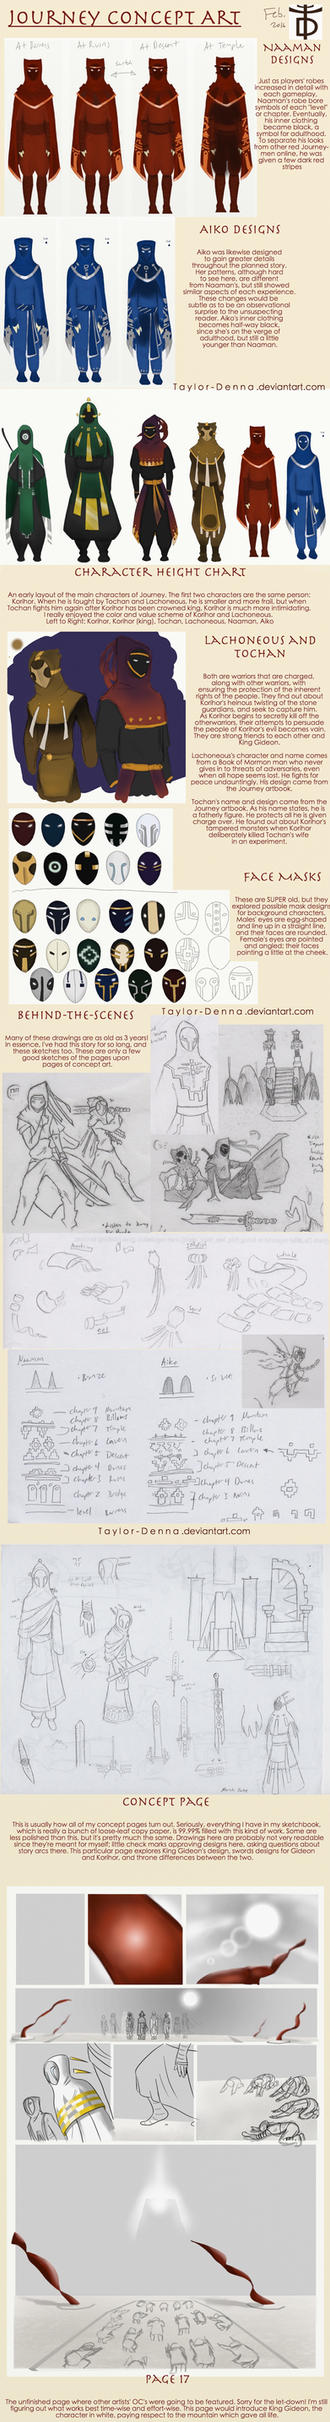 Journey Story Concept art by Taylor-Denna